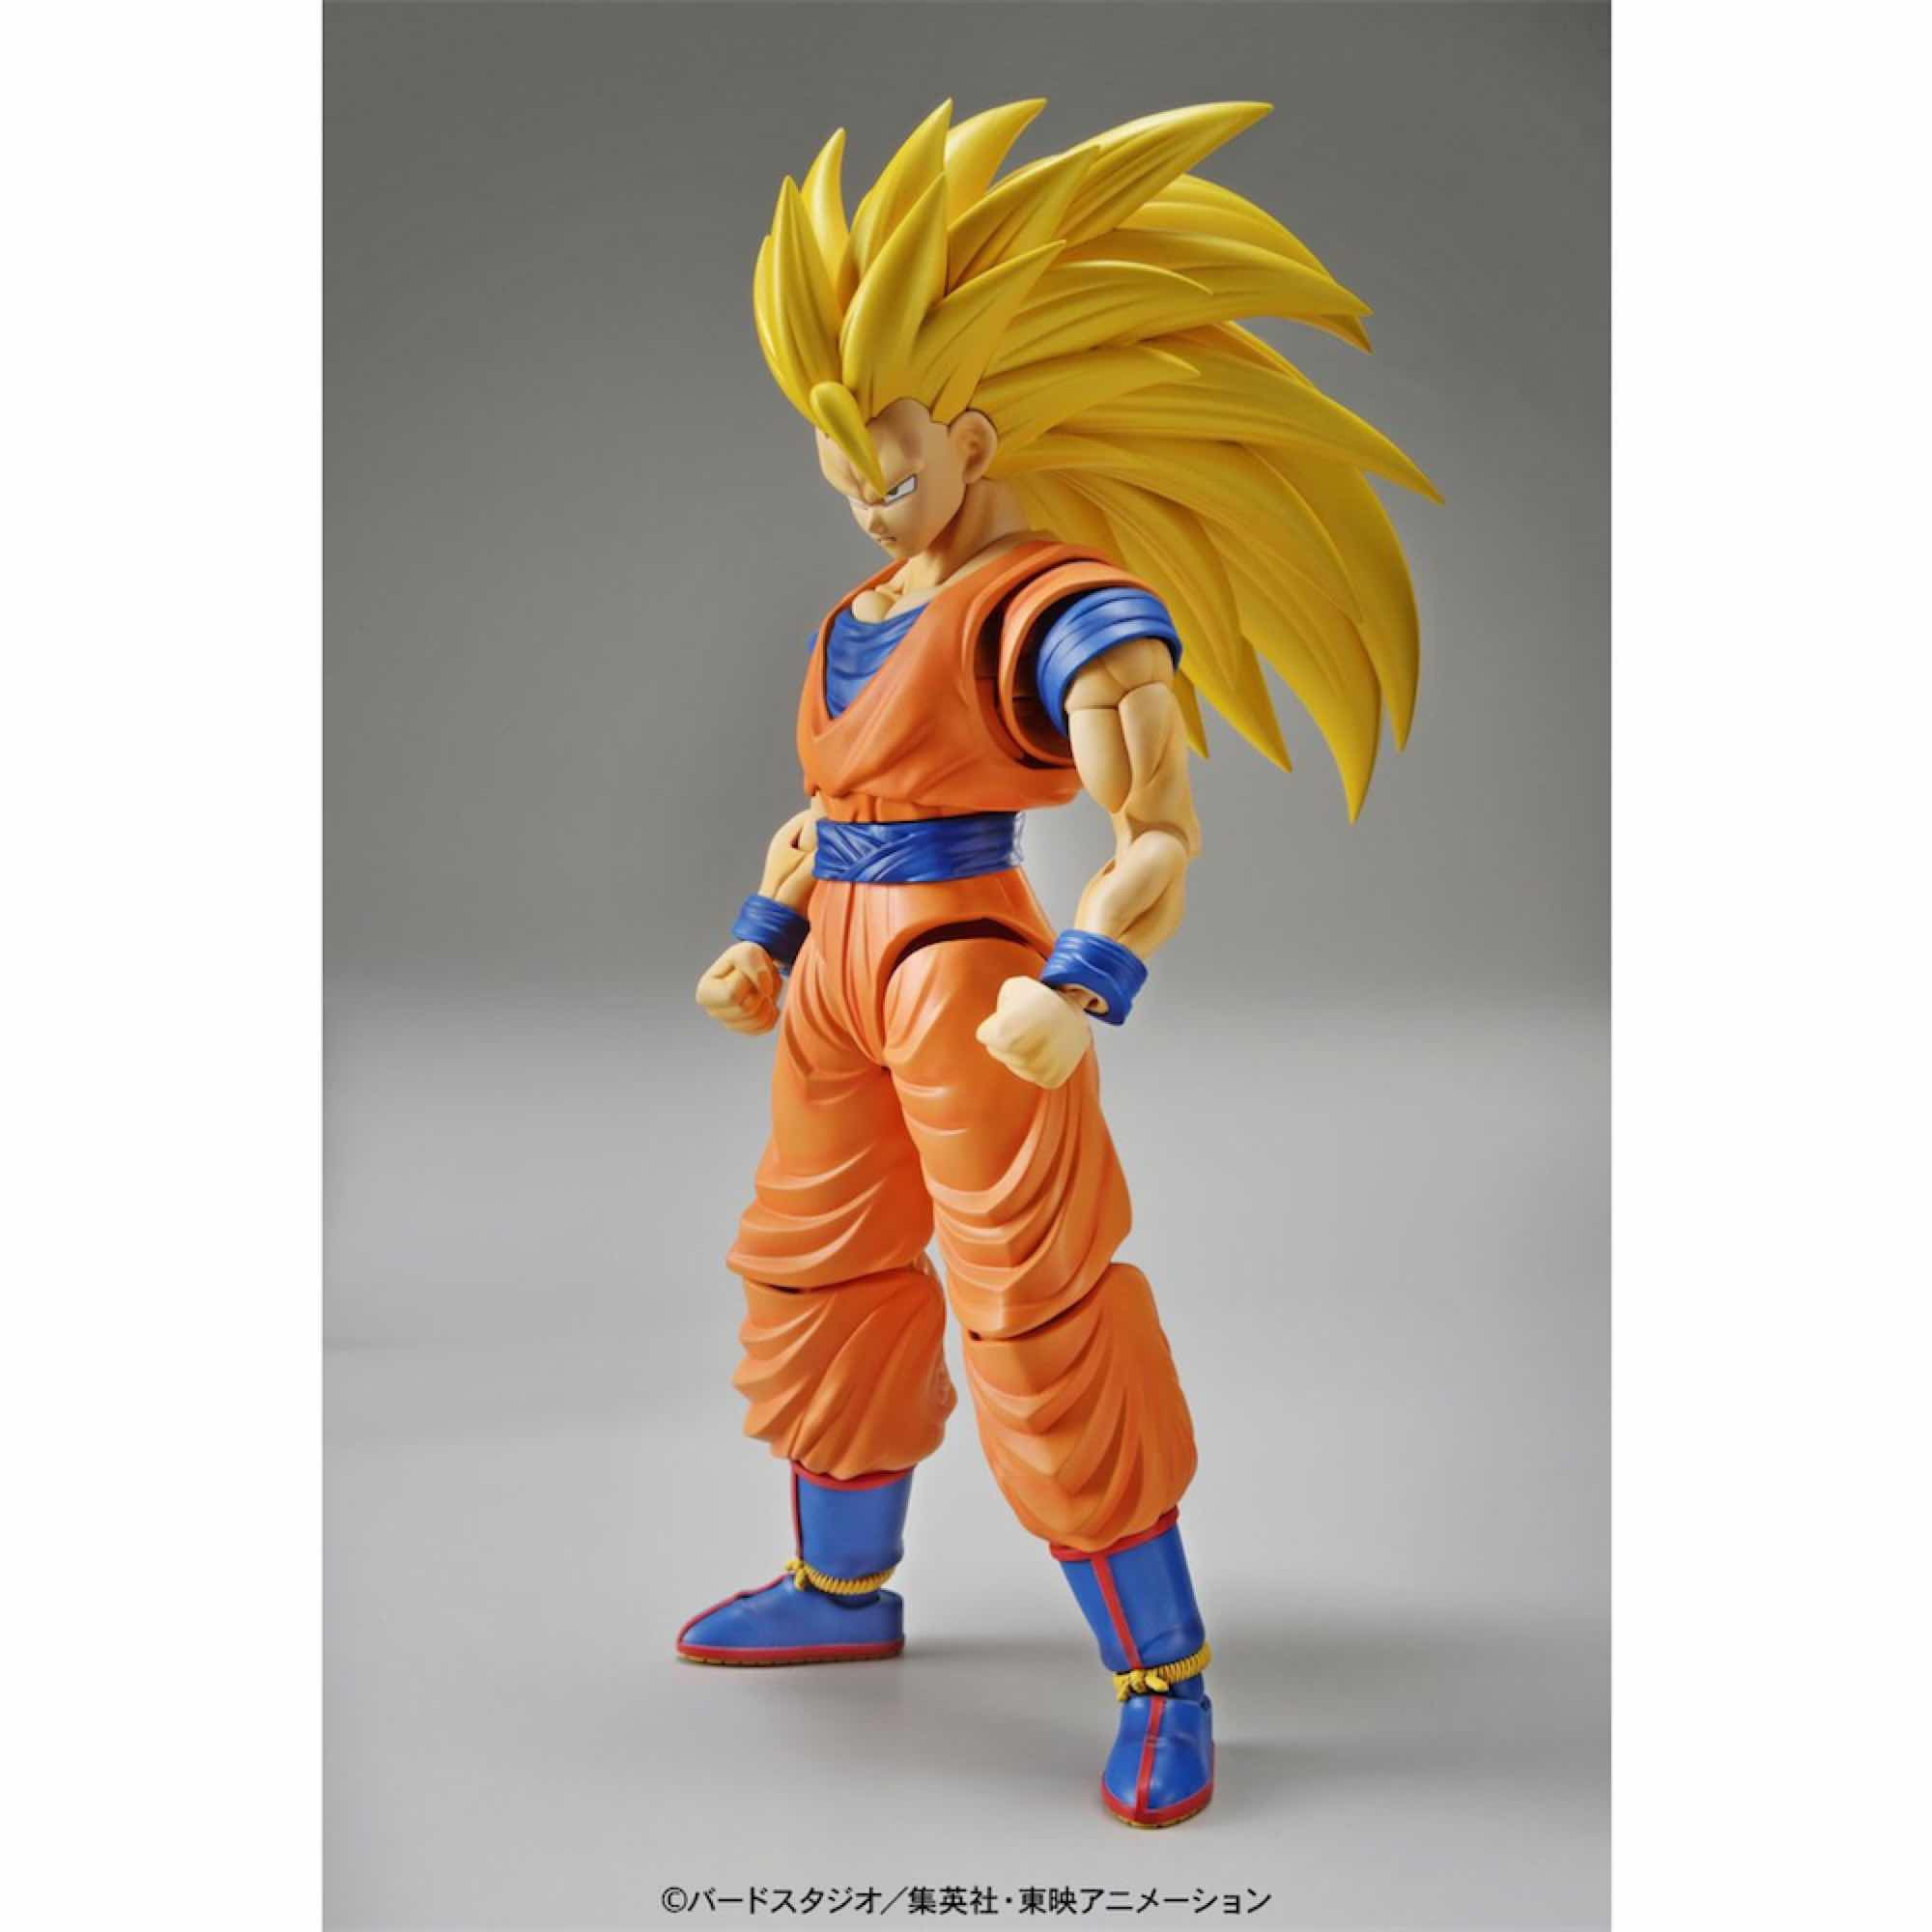 SON GOKU SUPER SAIYAN 3 MODEL KIT FIGURA 14 CM DRAGON BALL Z FIGURE-RISE STANDARD 84181P